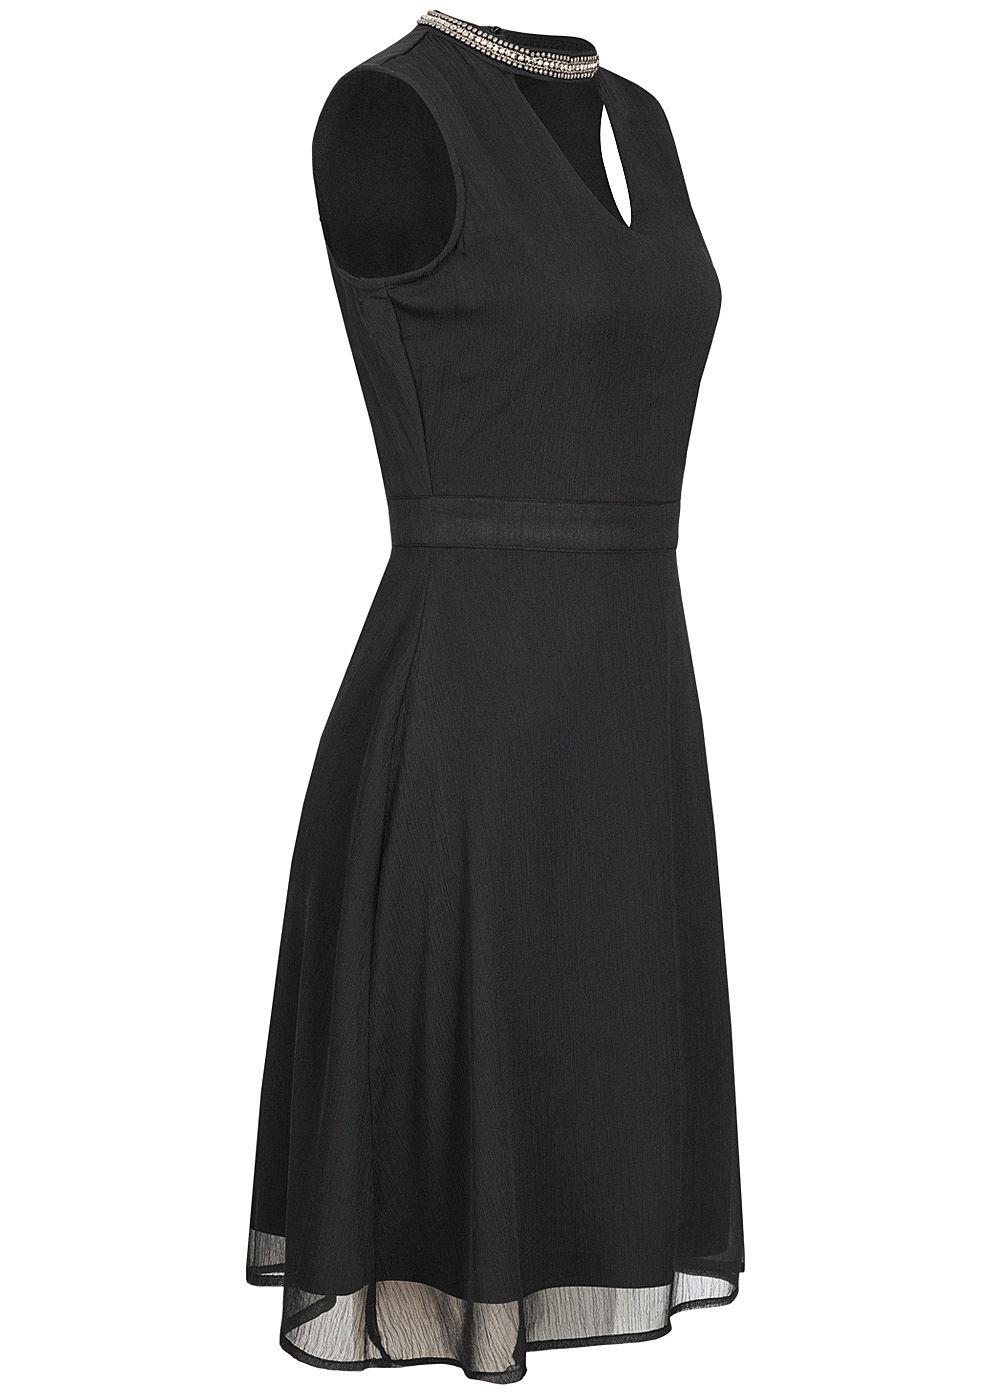 ONLY Damen V-Neck Choker Chiffon Kleid 18-lagig Schmuckapplikation schwarz